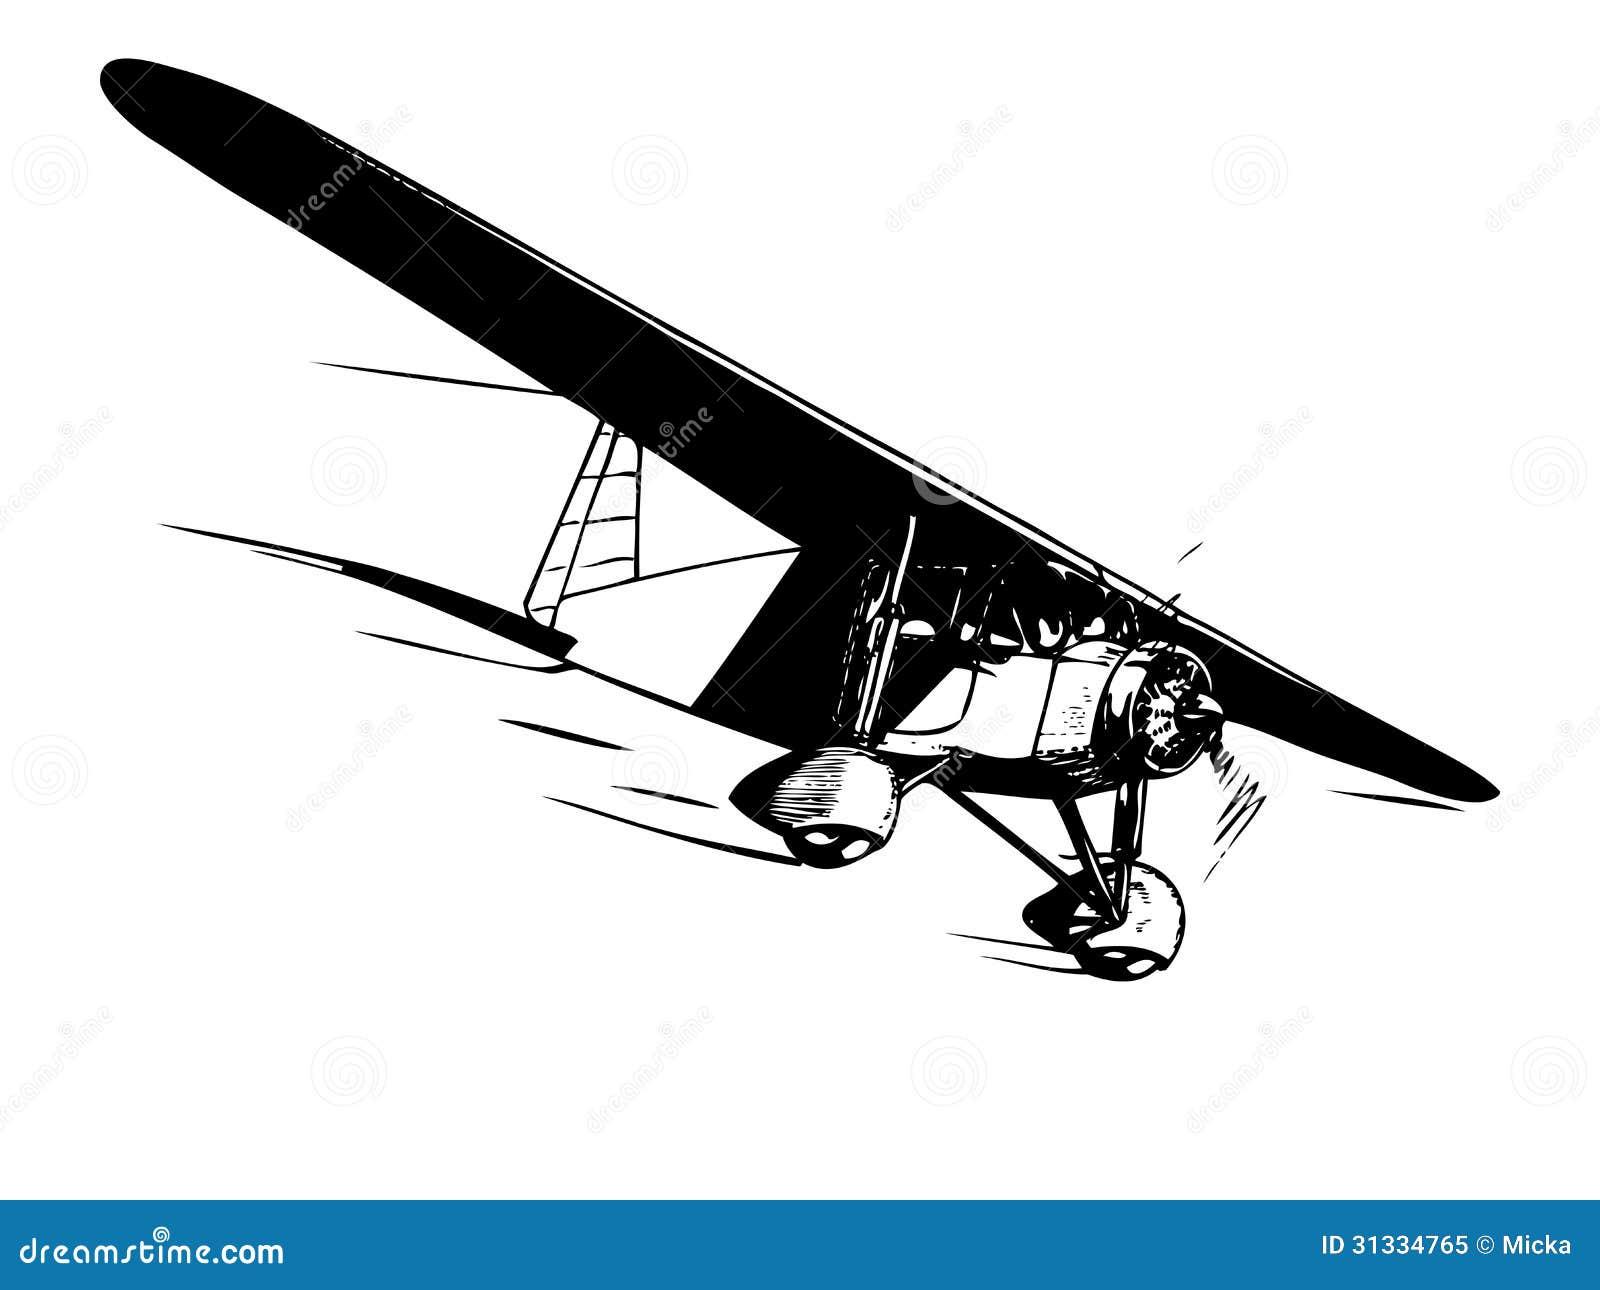 vintage airplane clipart - photo #37